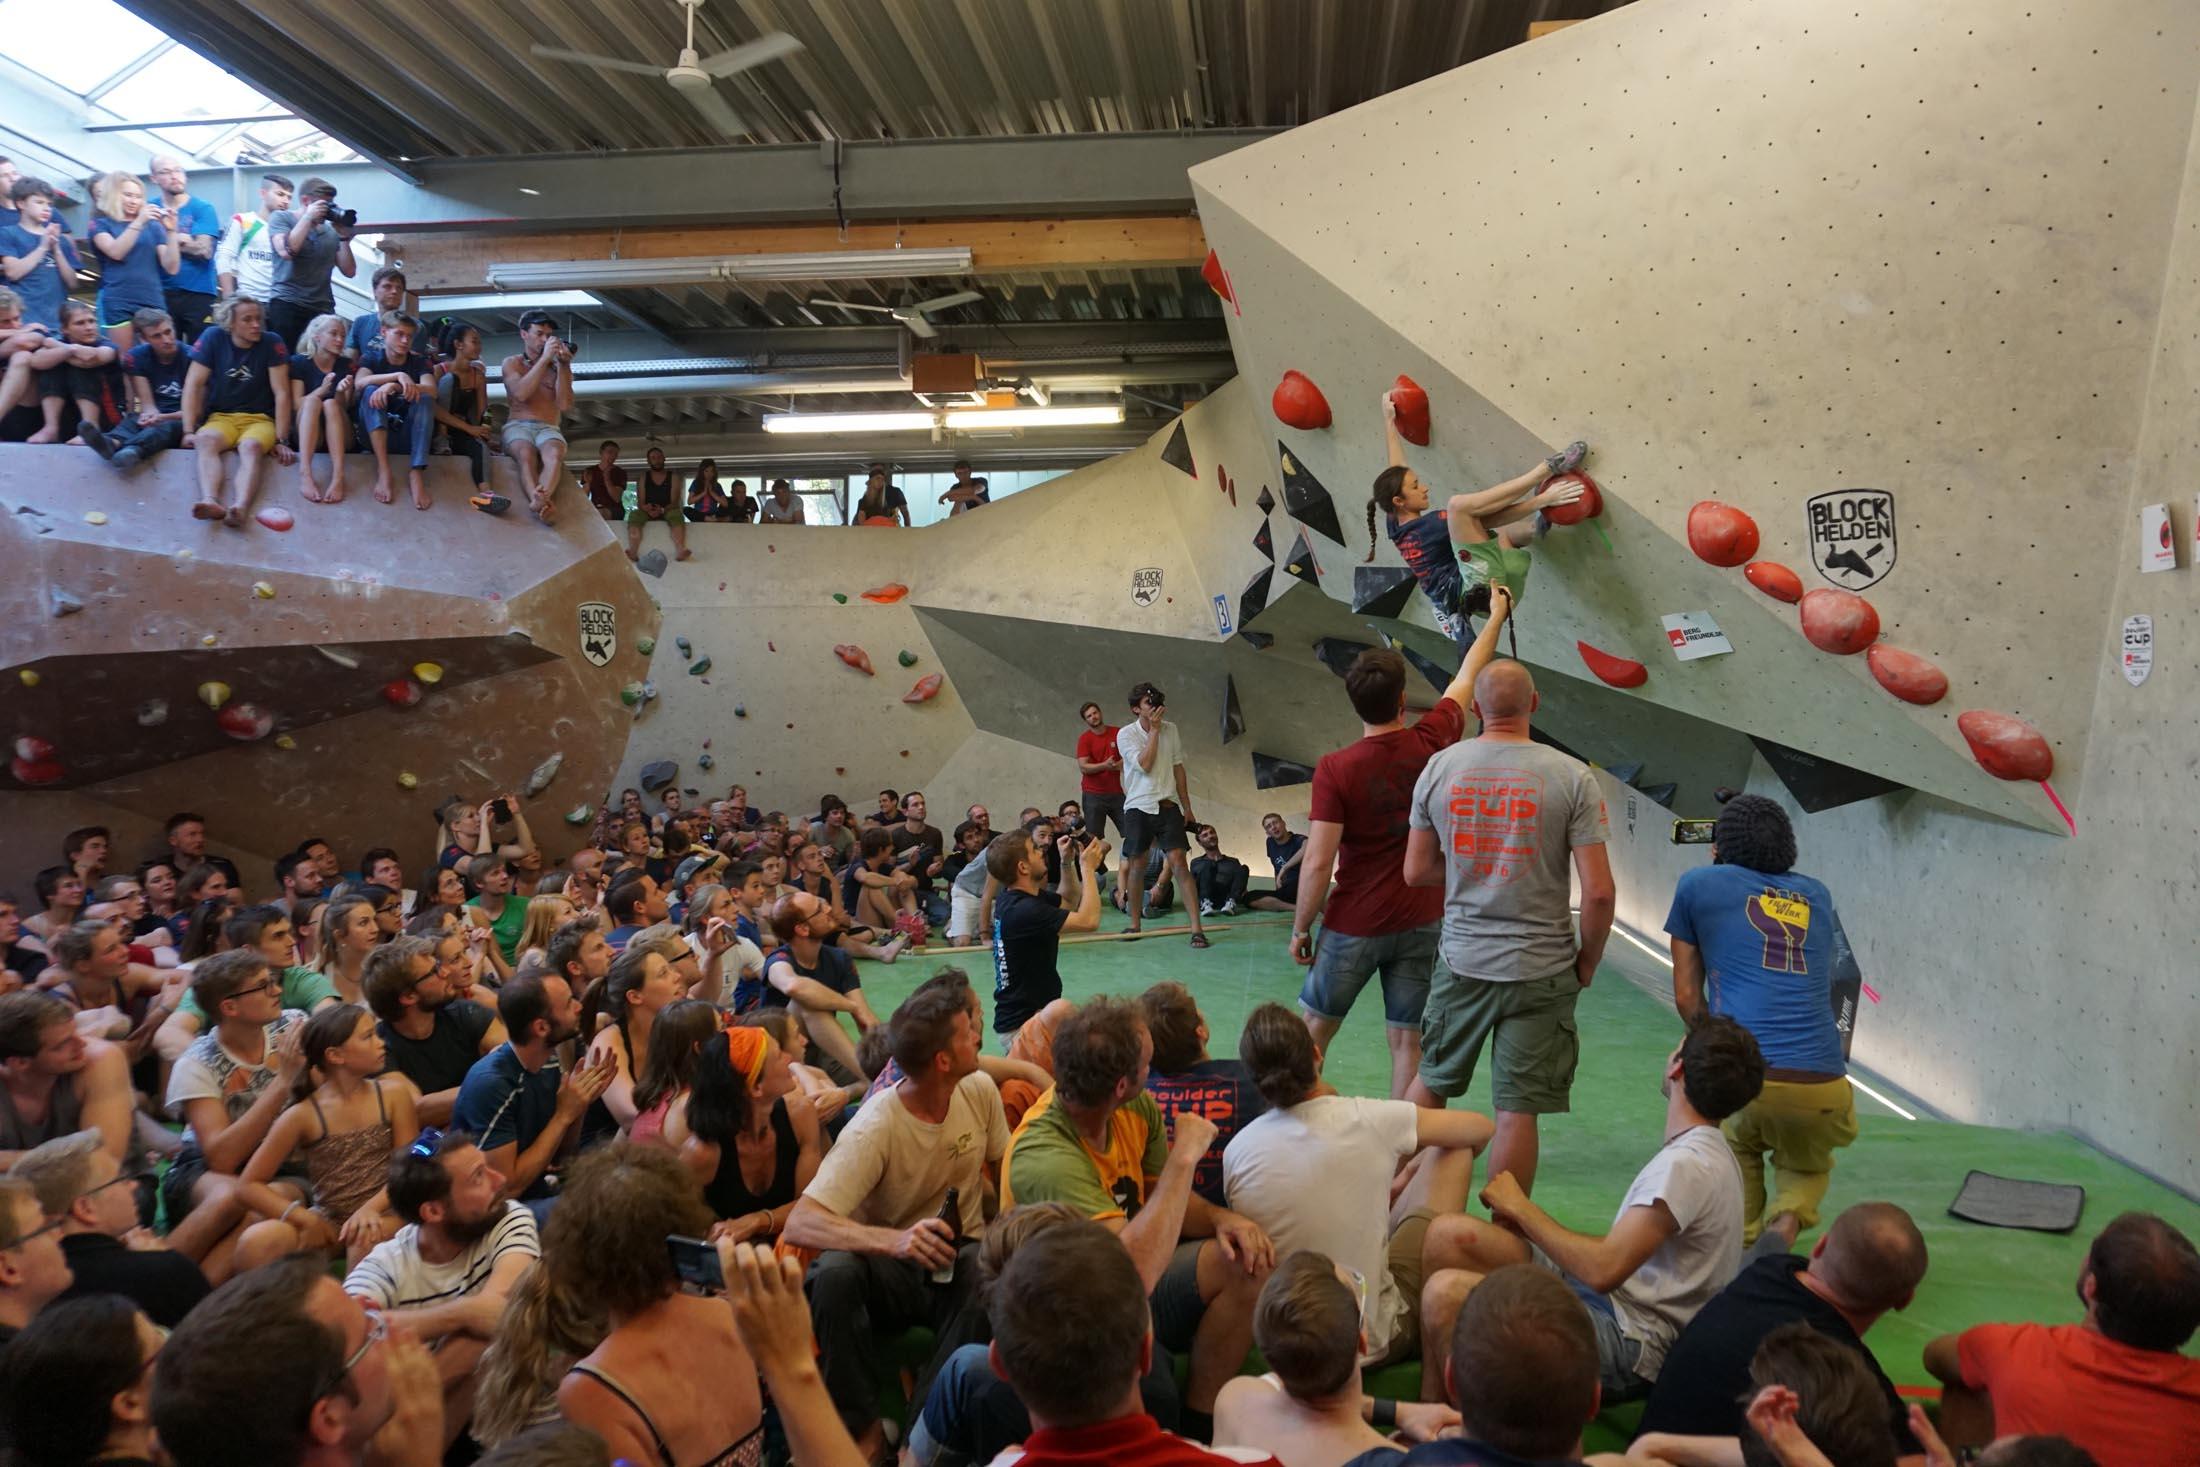 Finale, internationaler bouldercup Frankenjura 2016, BLOCKHELDEN Erlangen, Mammut, Bergfreunde.de, Boulderwettkampf07092016634